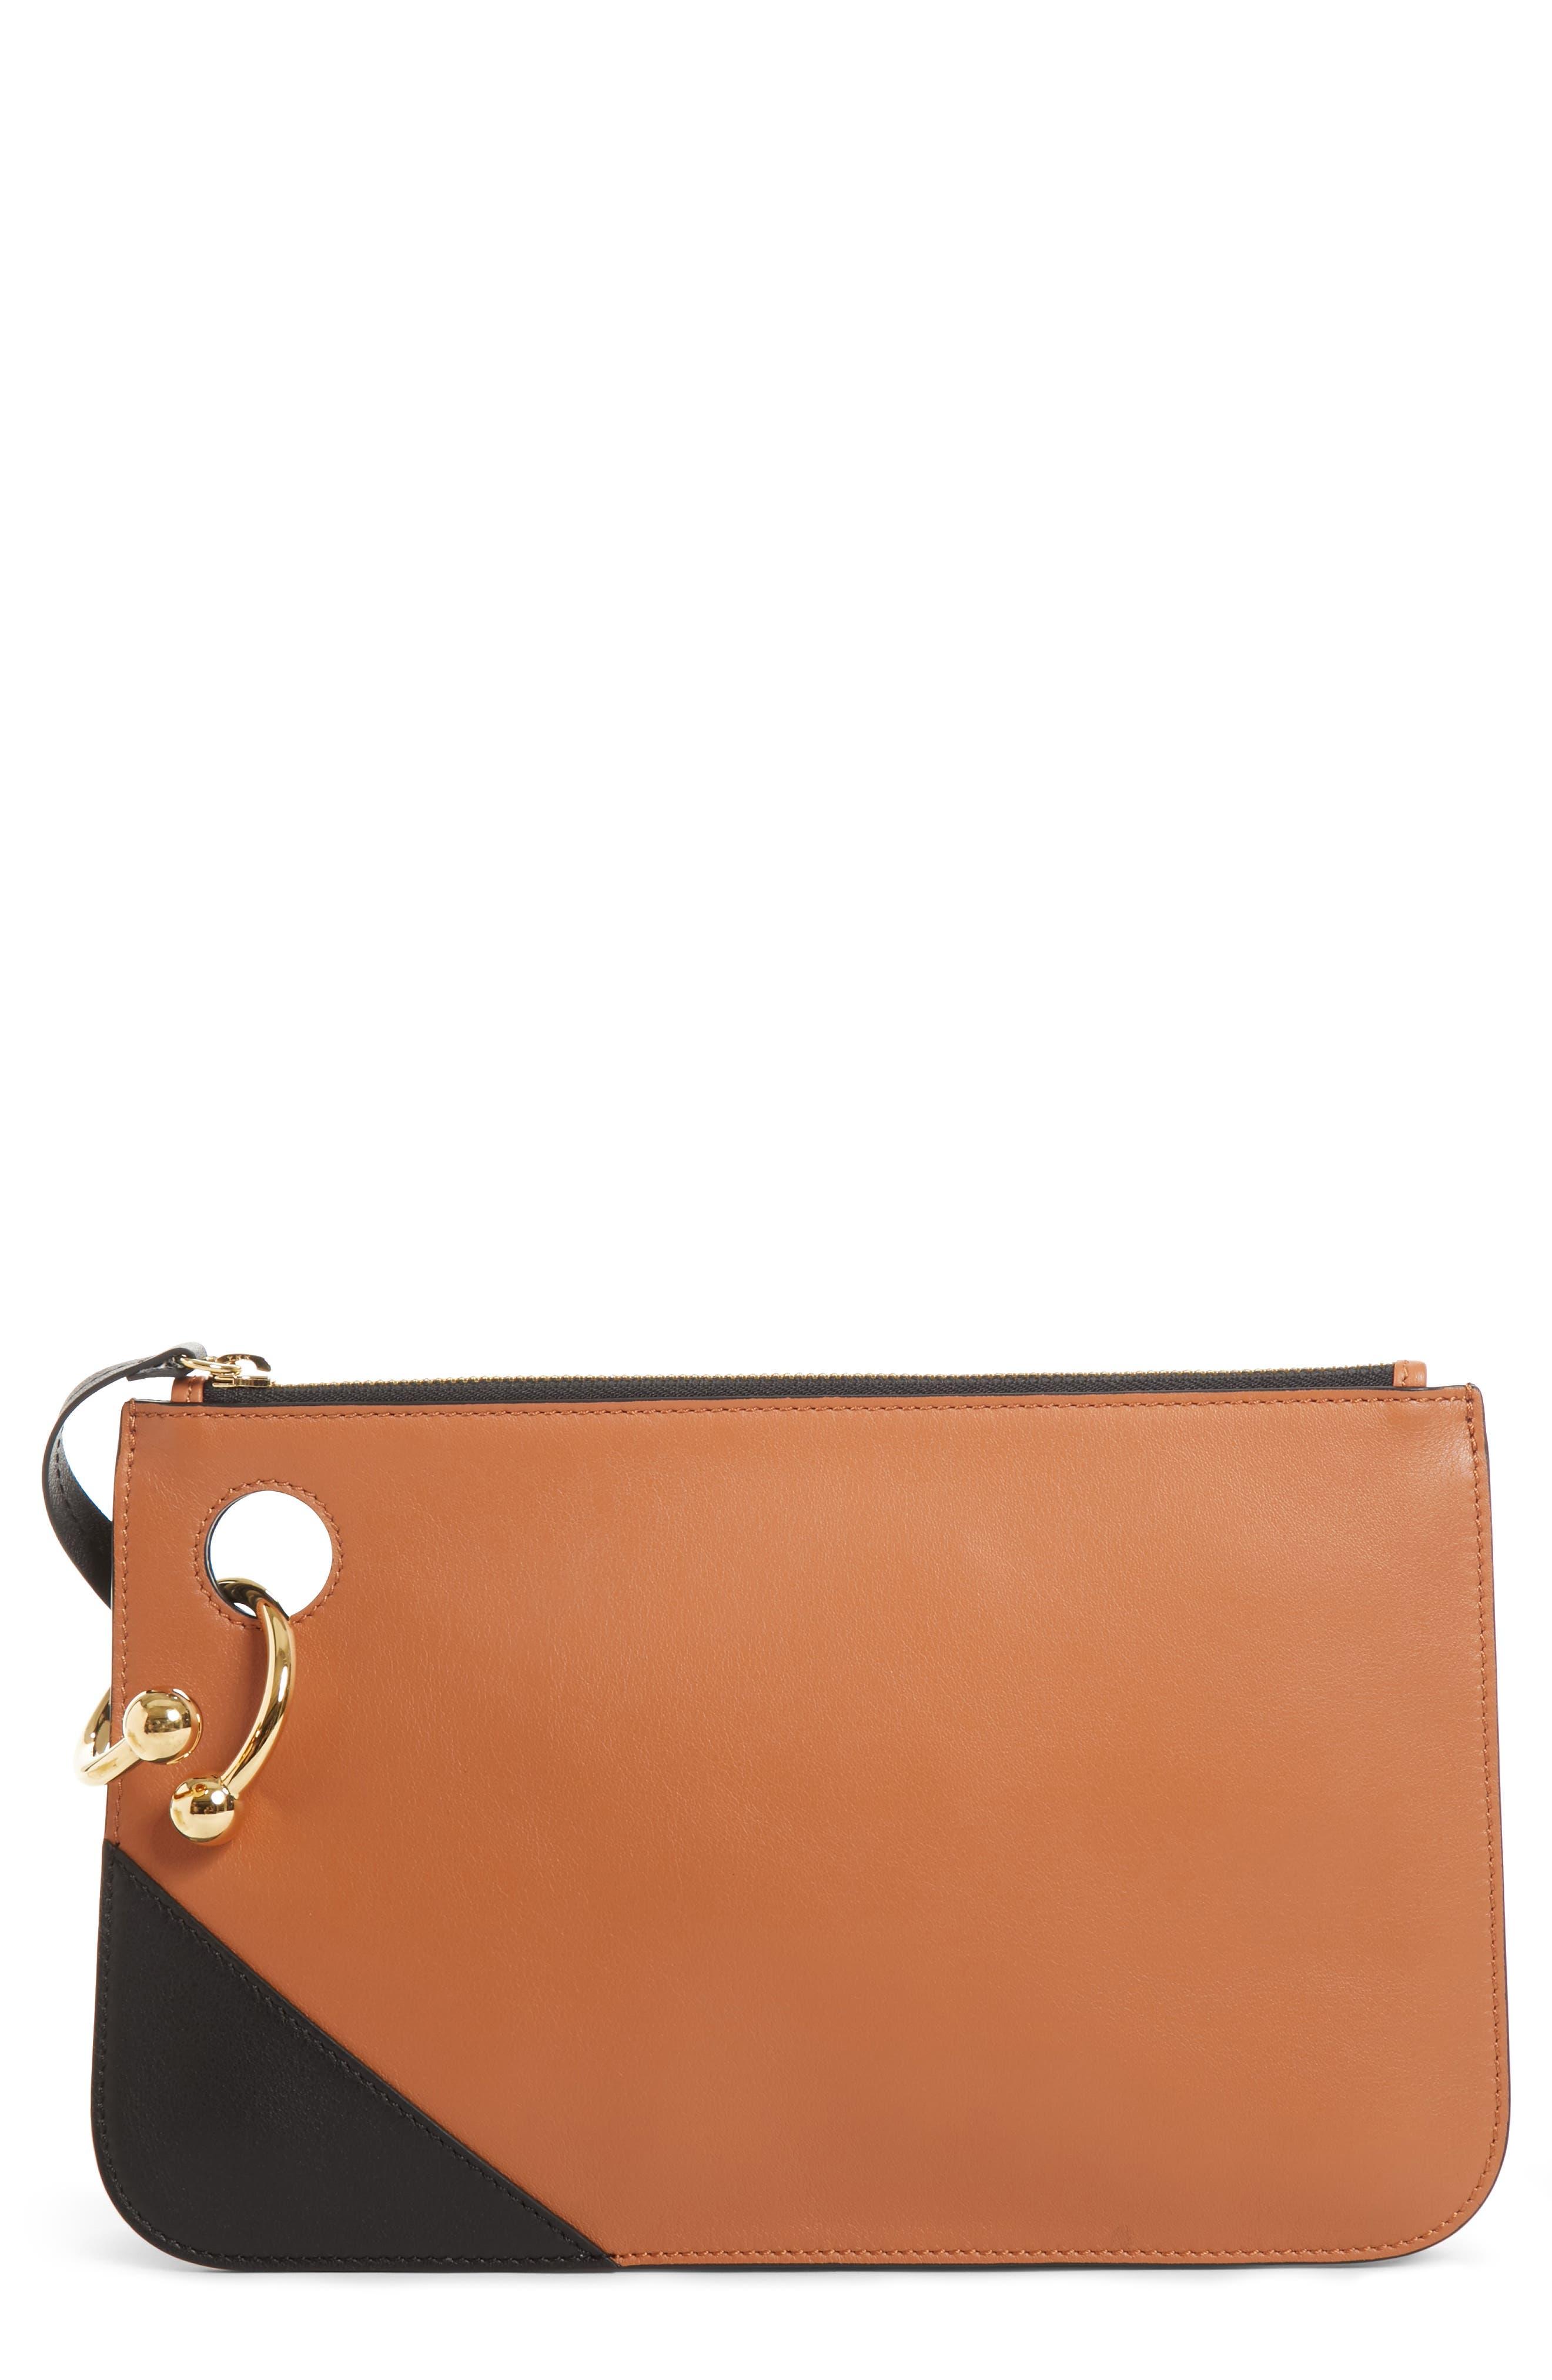 J.W.ANDERSON Pierce Colorblock Leather Clutch